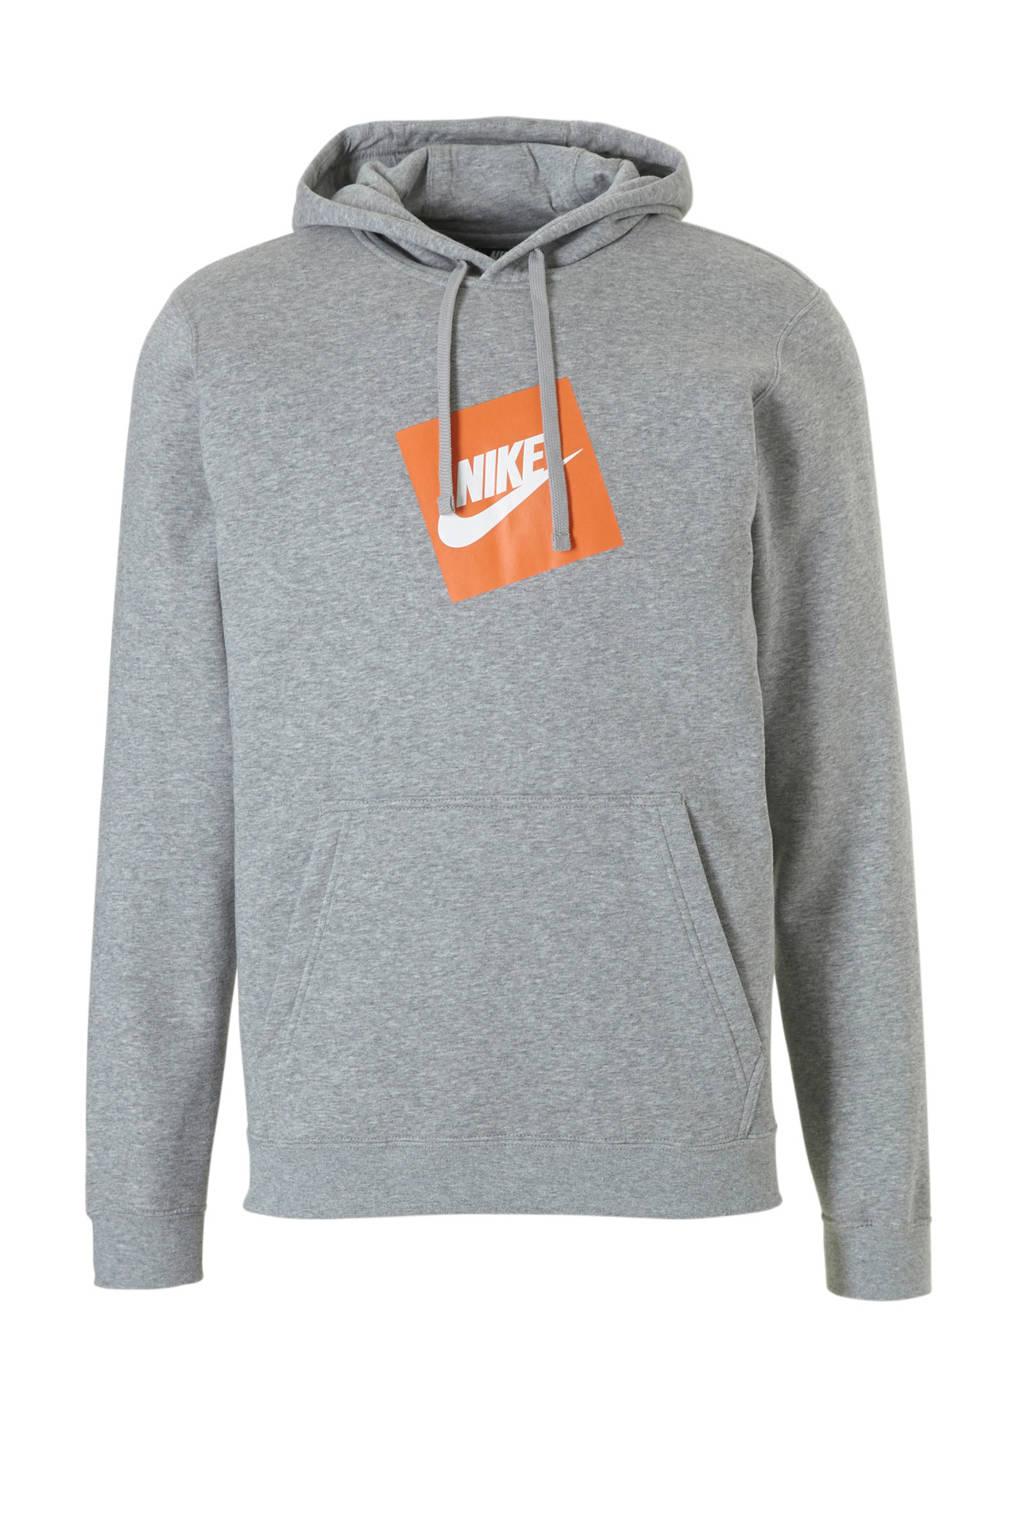 Nike   hoodie lichtgrijs, grijs melange/oranje/wit